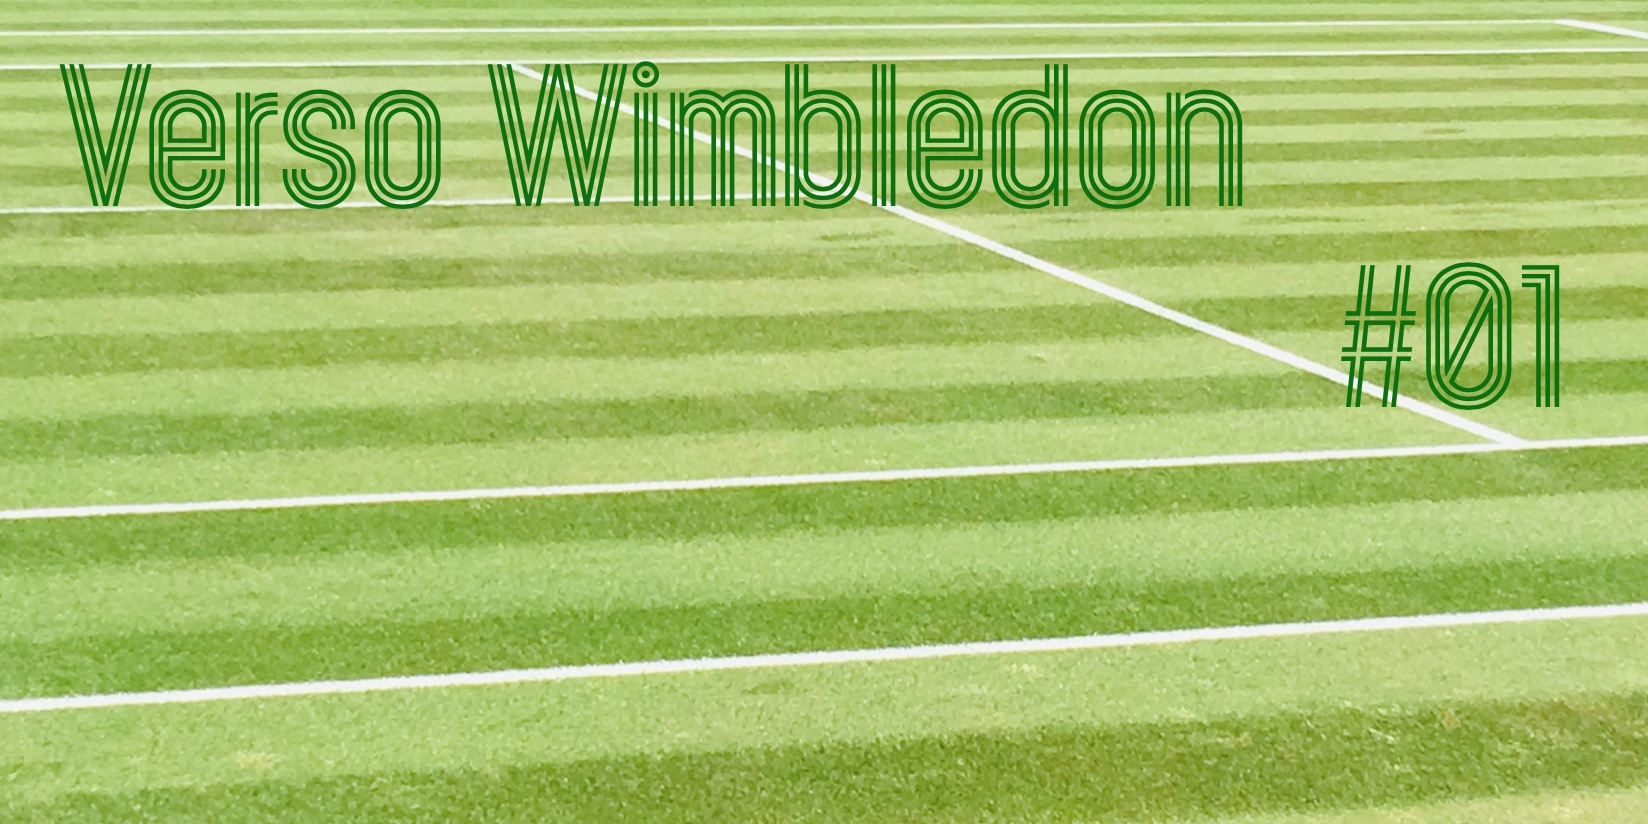 Verso Wimbledon #1 - settesei.it